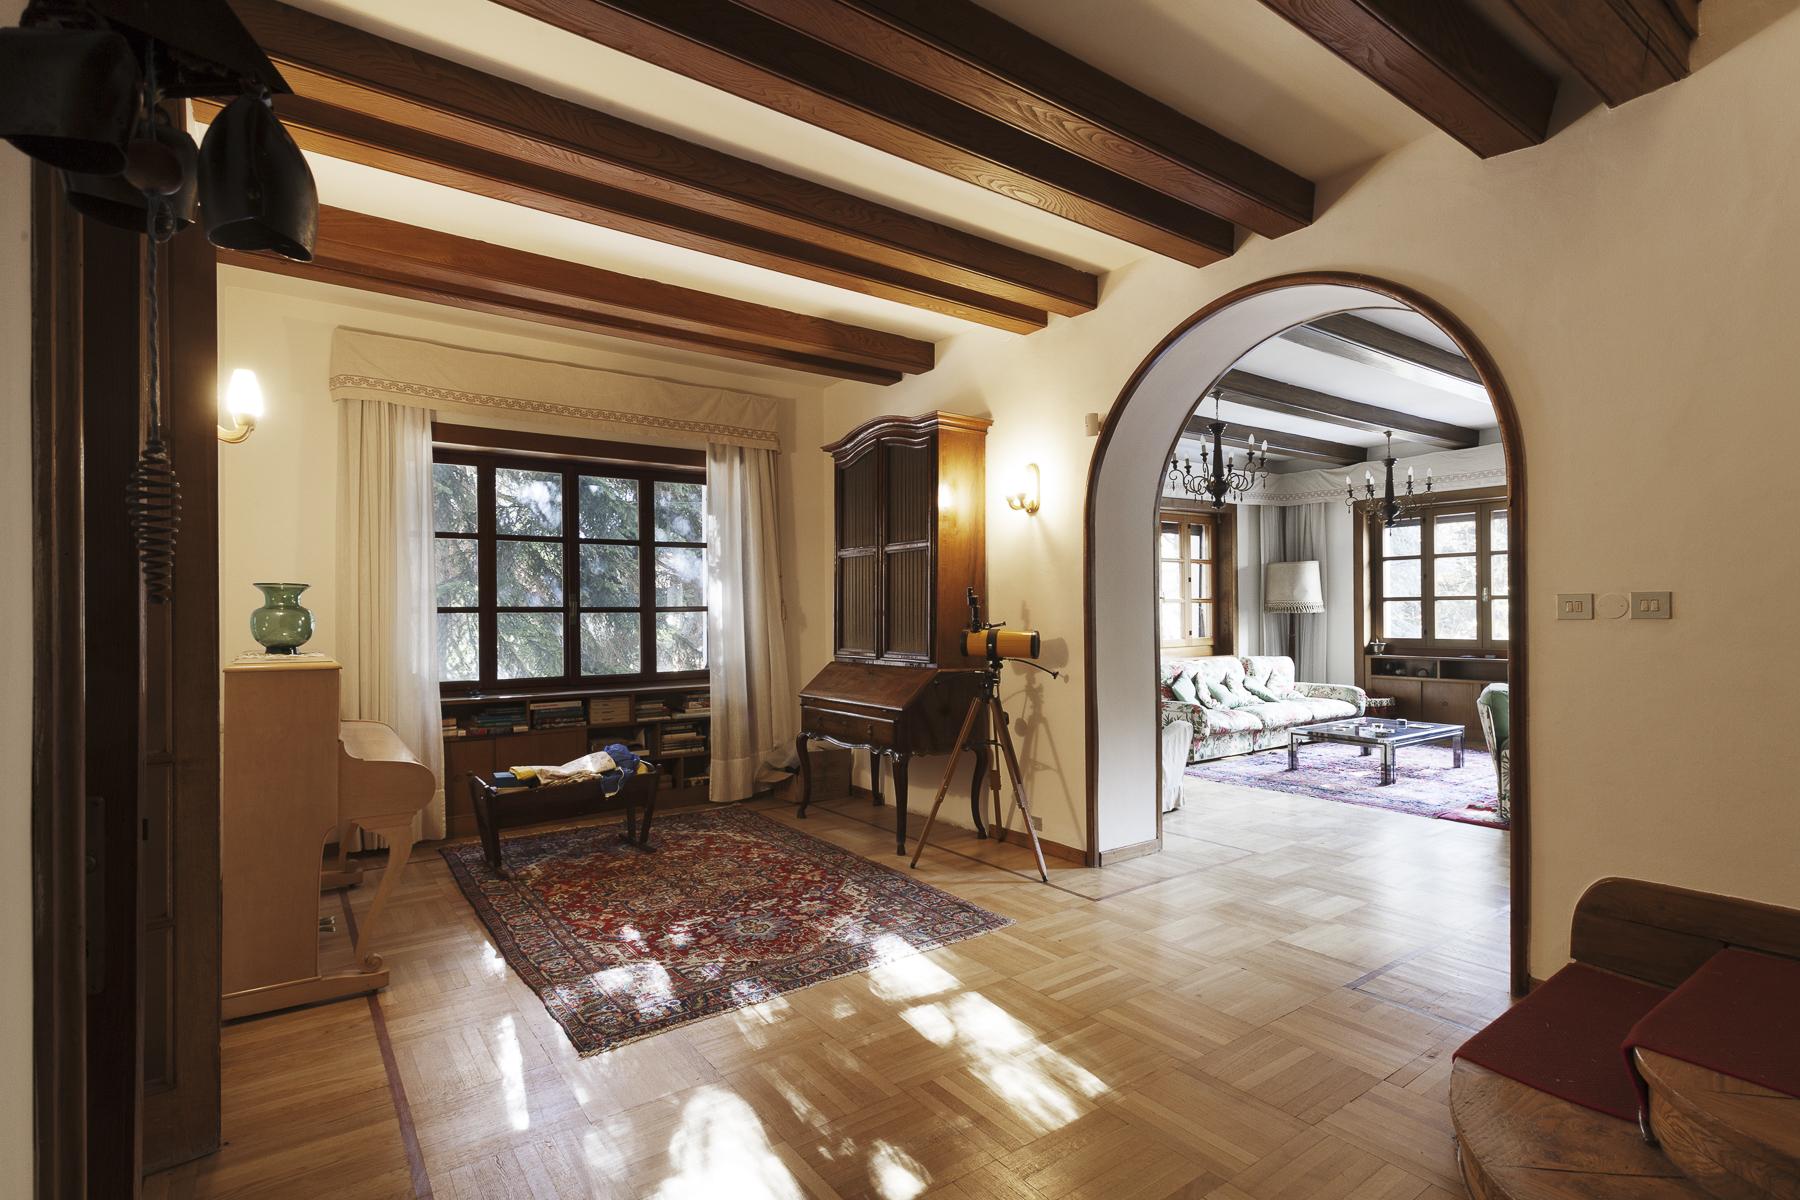 Villa in Vendita a Courmayeur: 5 locali, 2200 mq - Foto 4